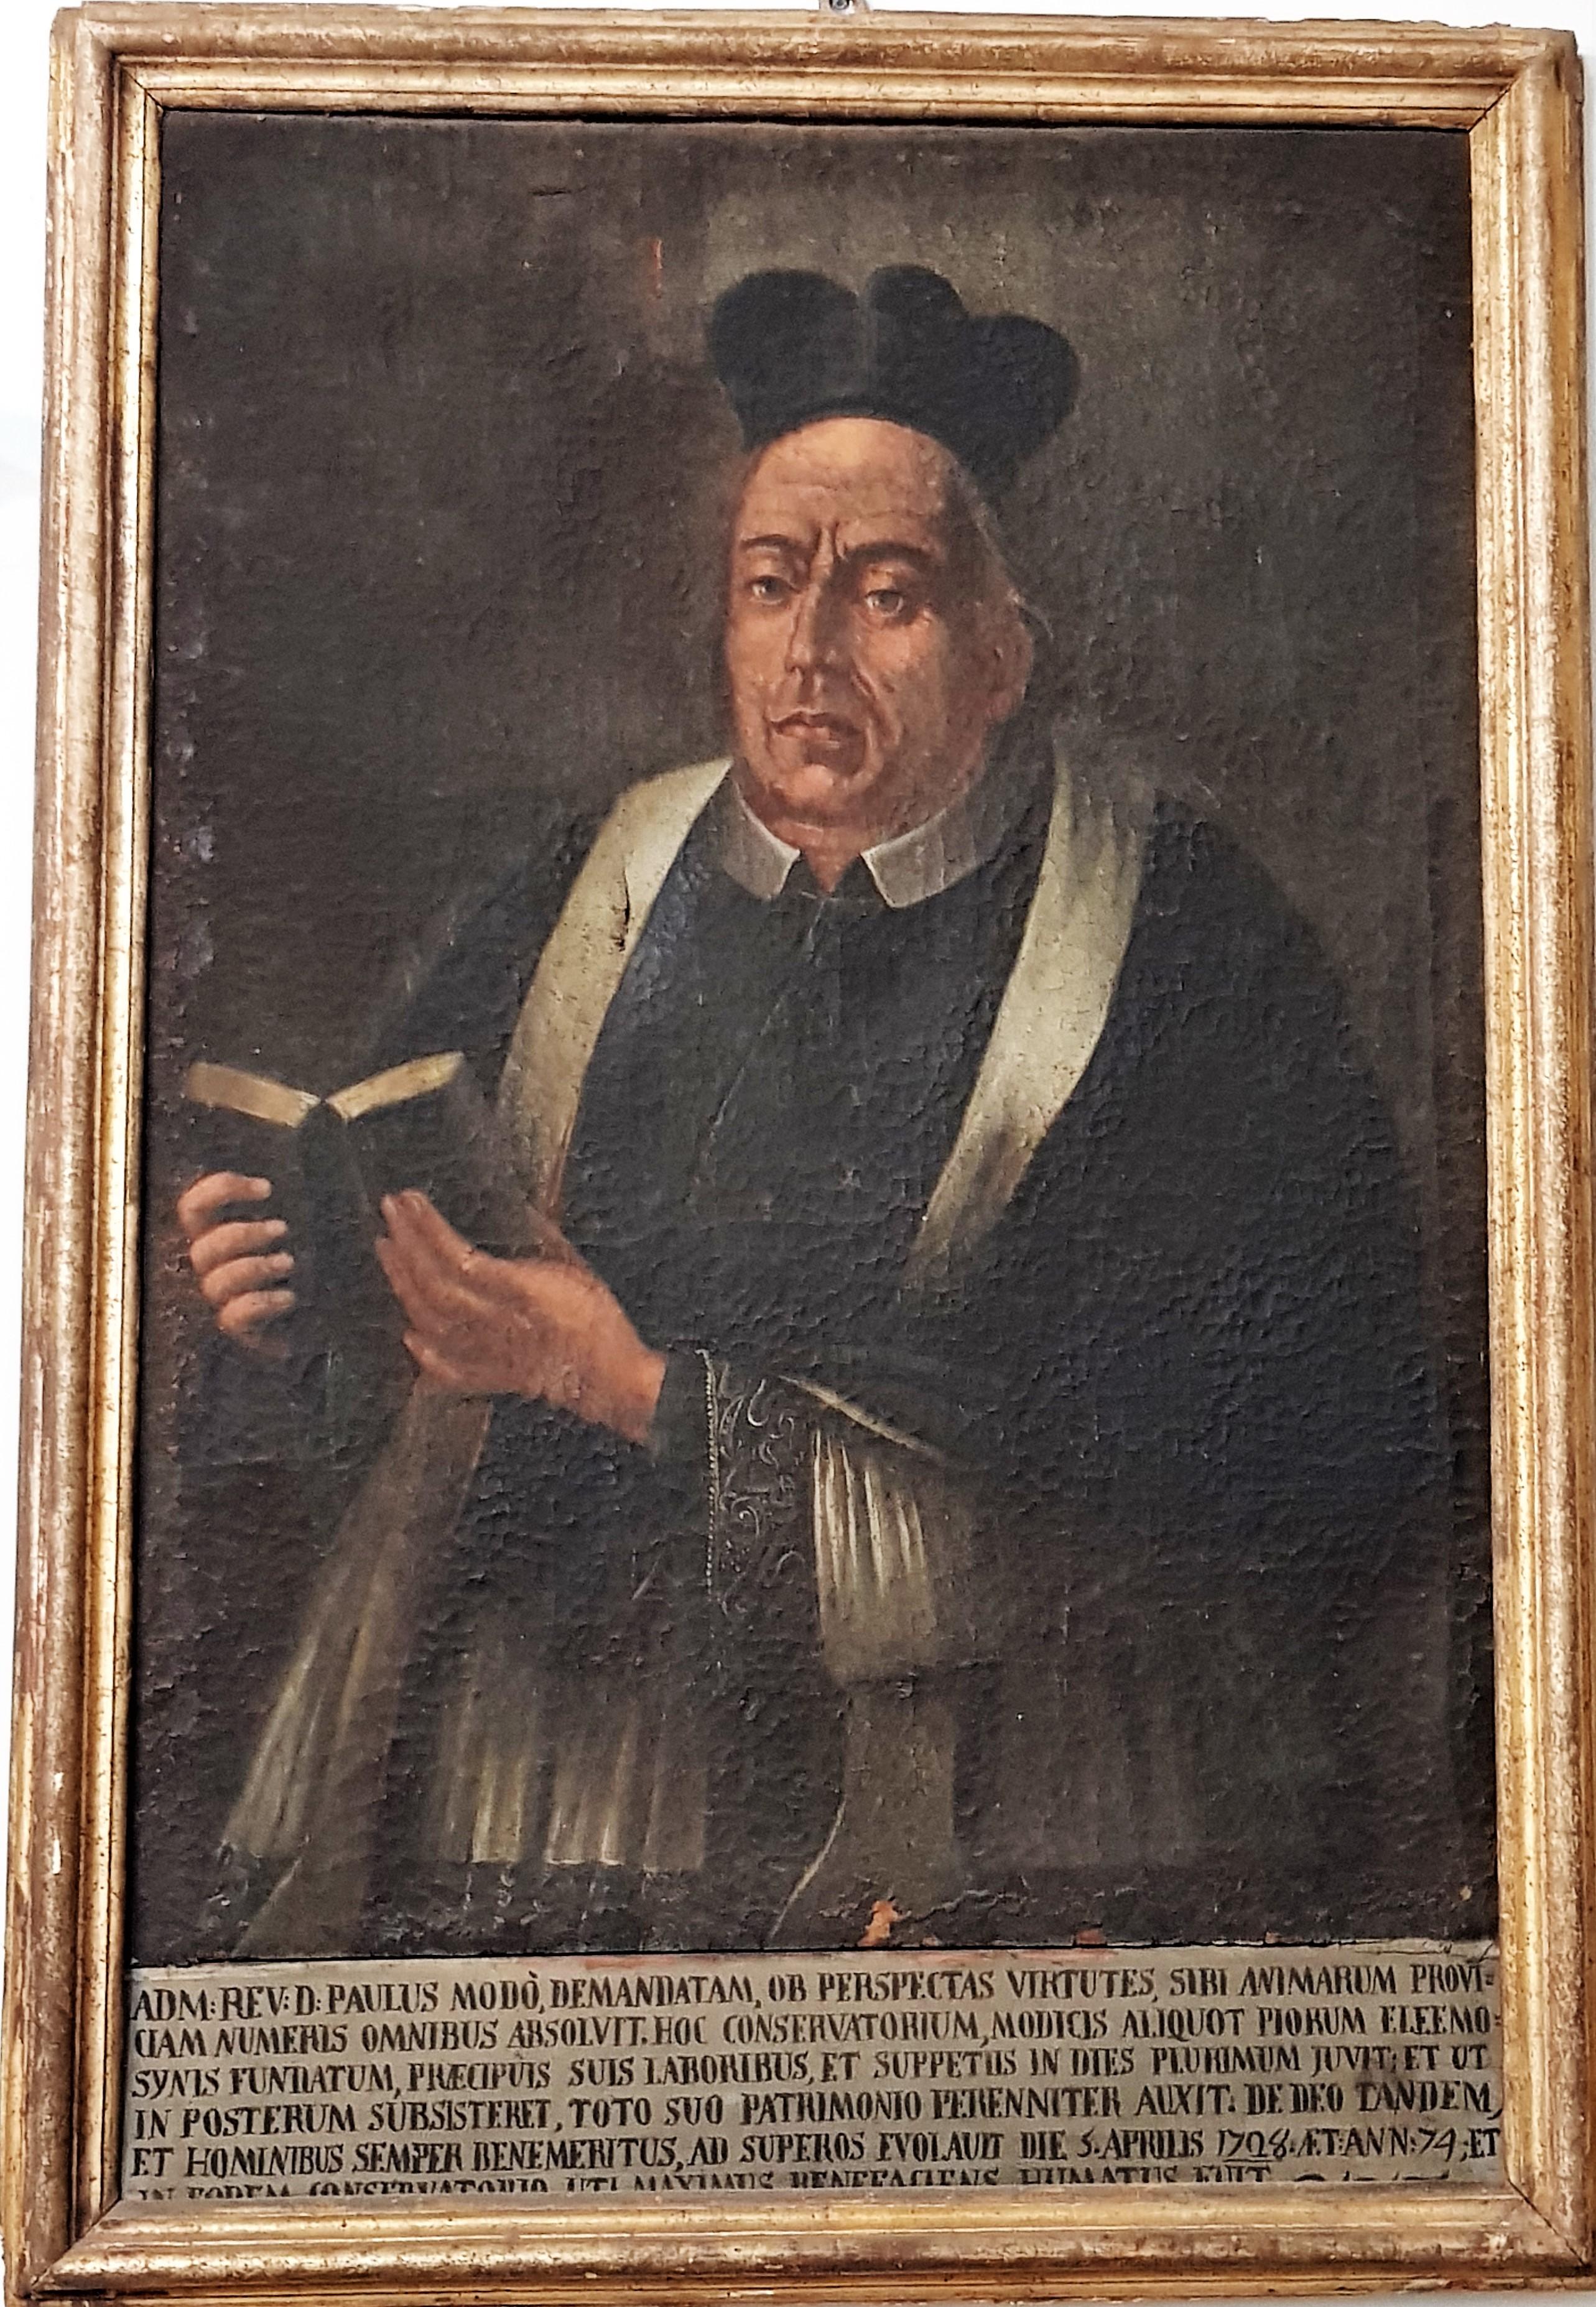 Sacerdote Paolo Modò